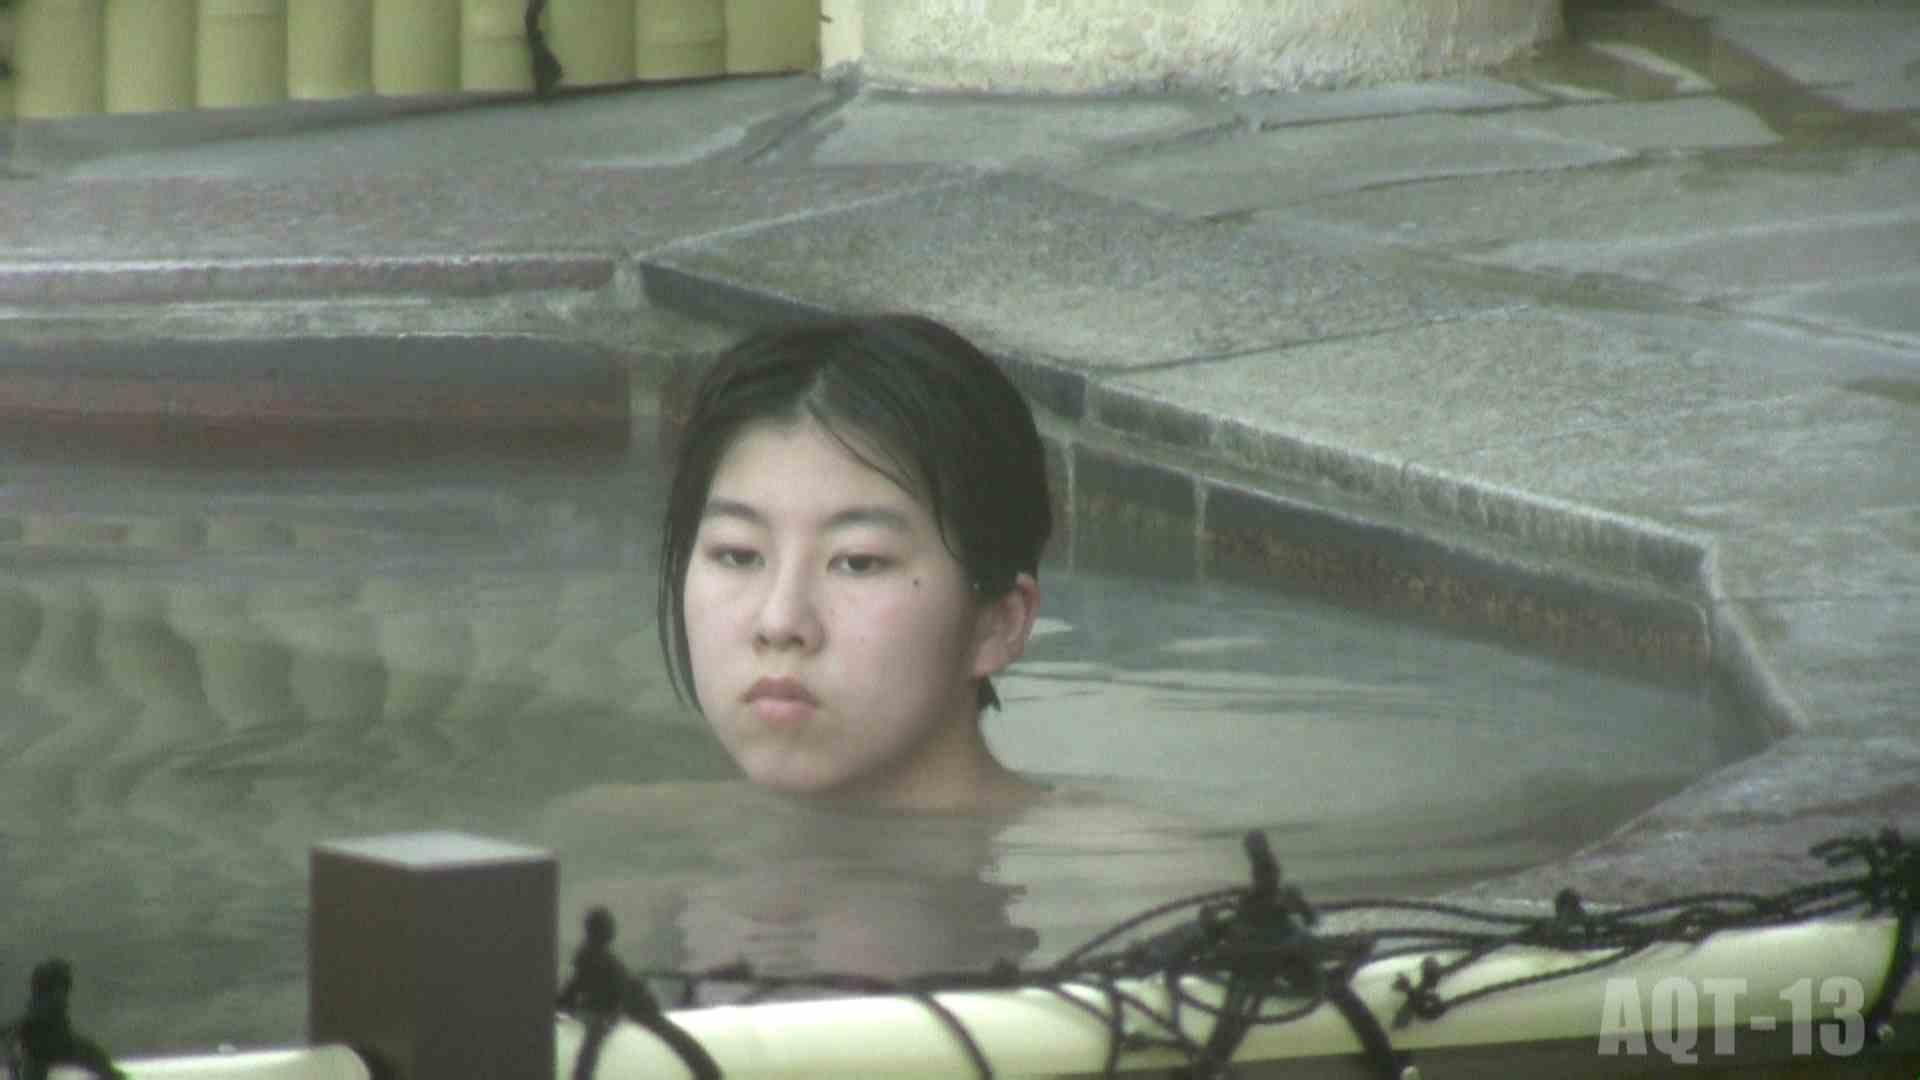 Aquaな露天風呂Vol.816 OLのエロ生活 | 露天風呂  90連発 34